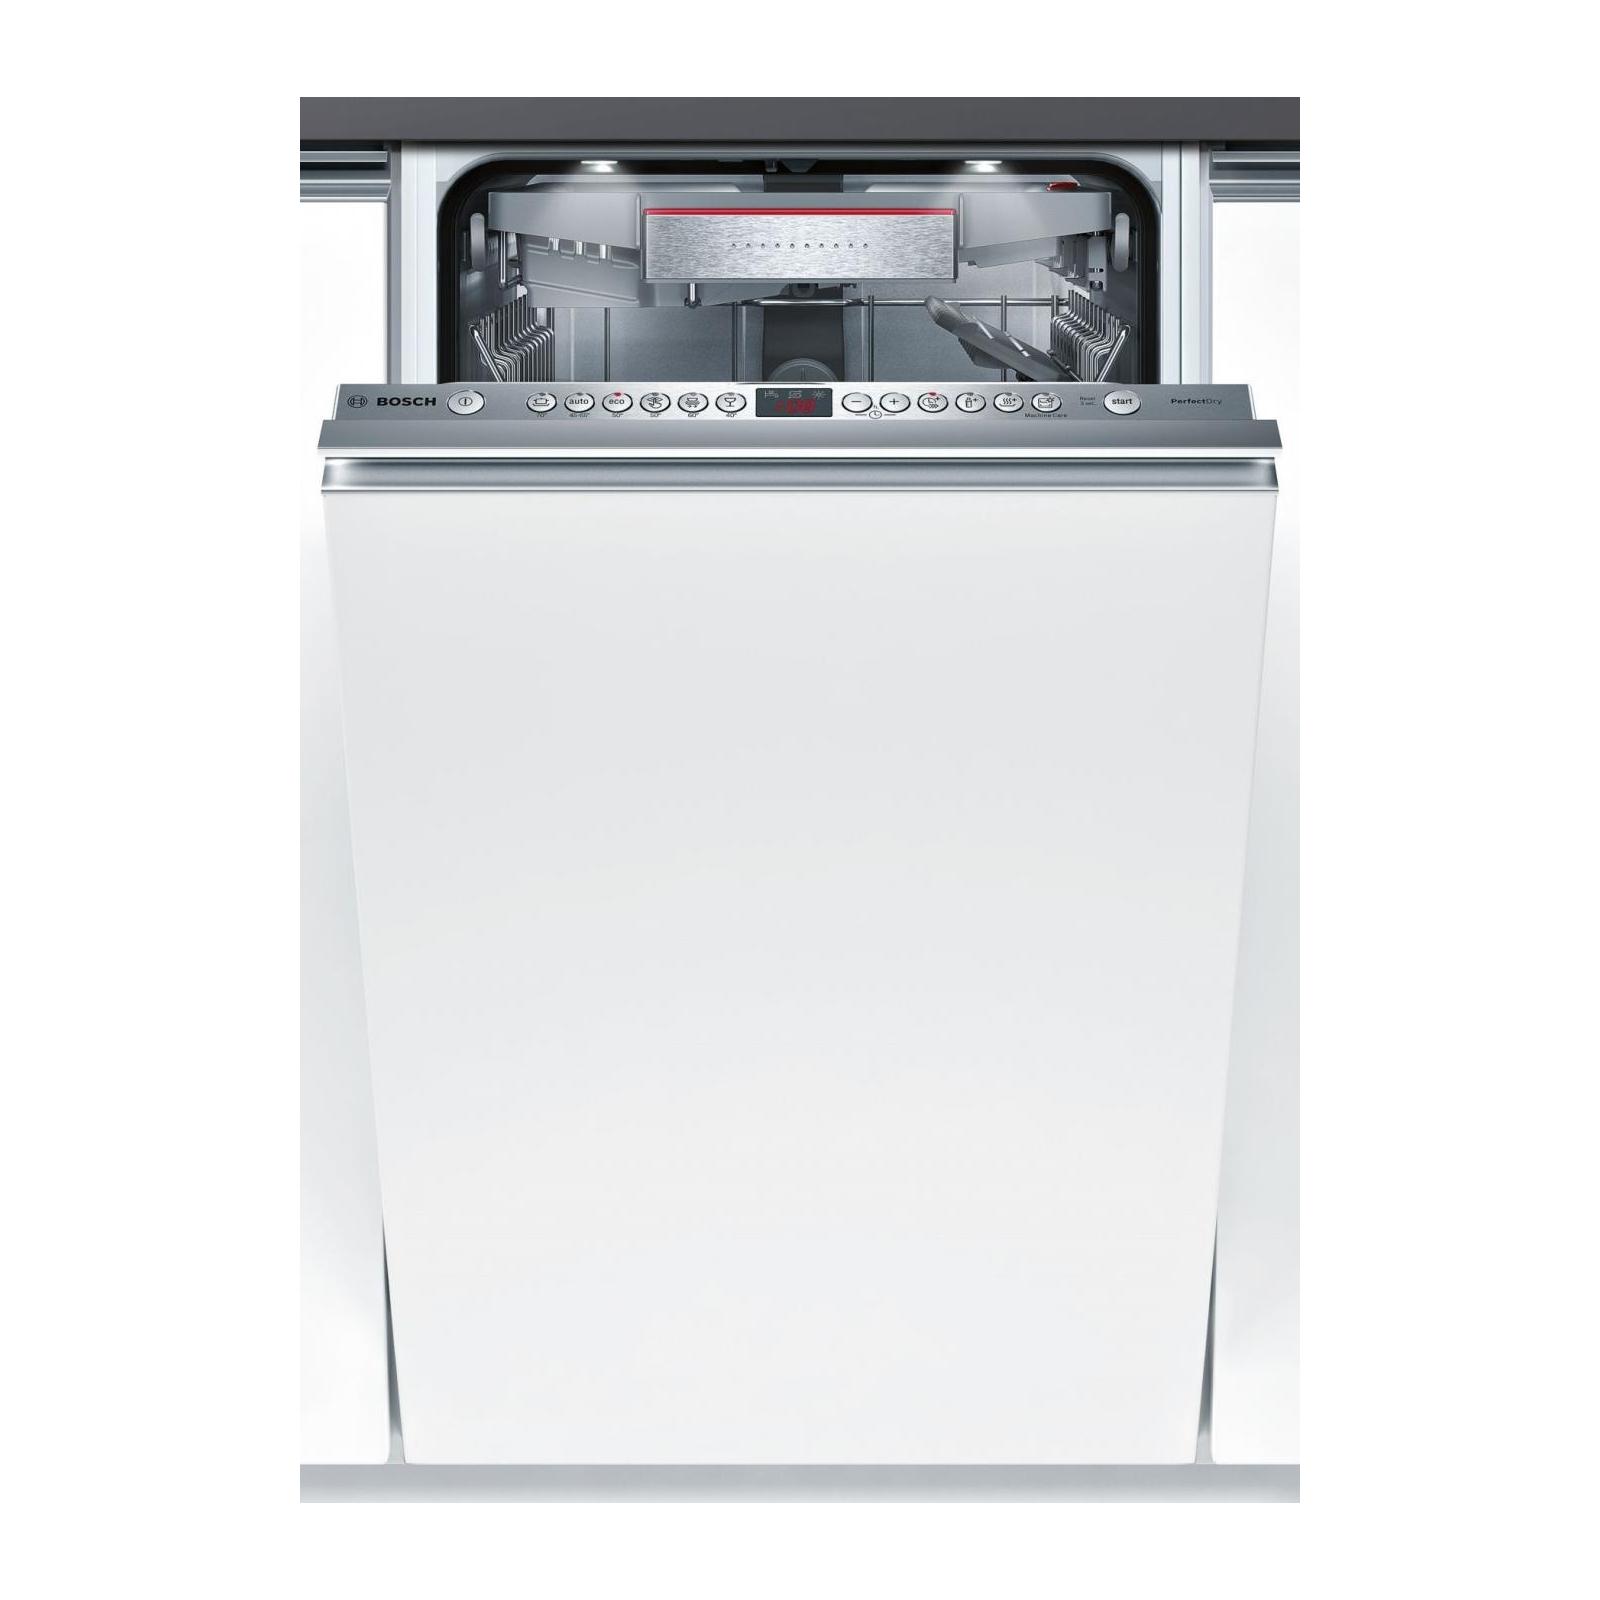 Посудомоечная машина BOSCH SPV 66 TX01E (SPV66TX01E)